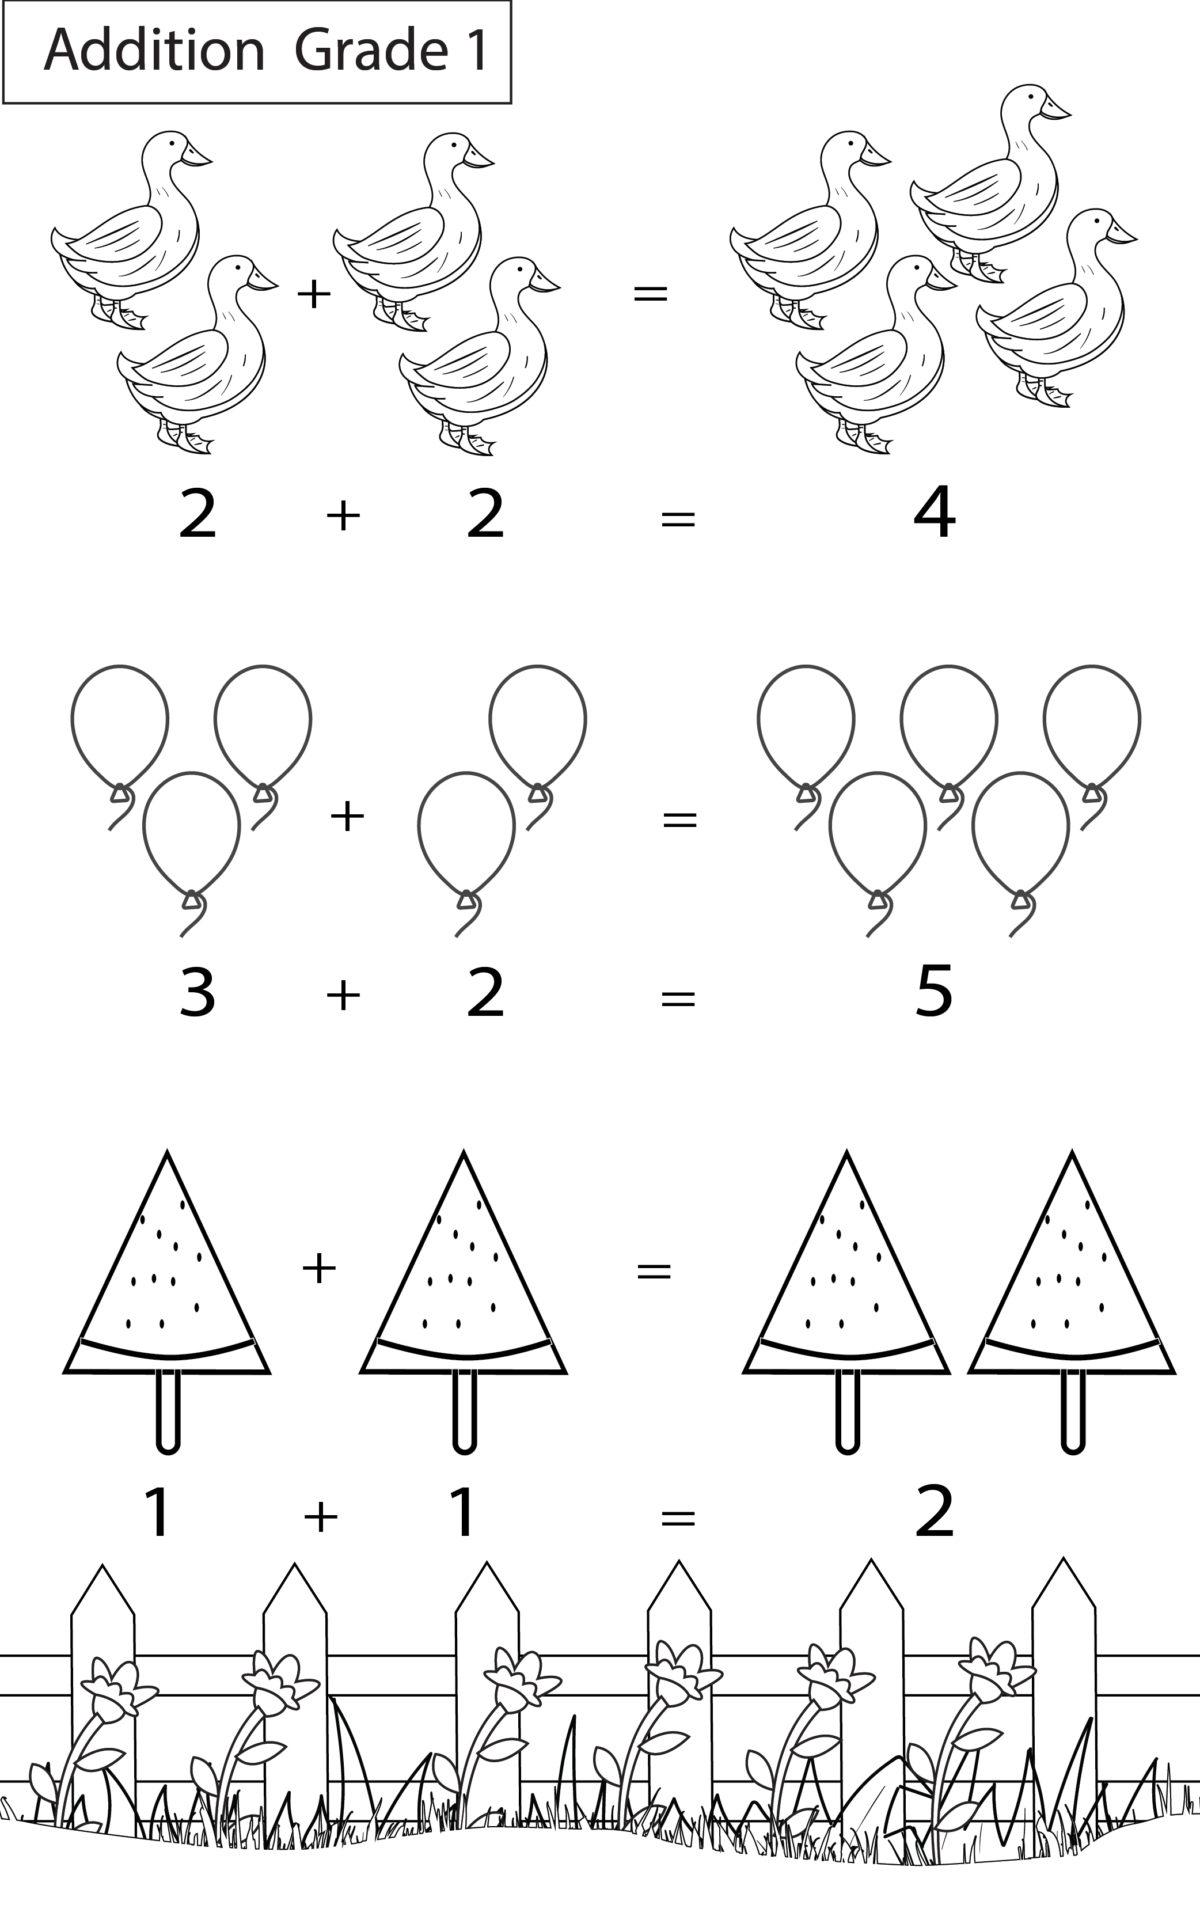 - Maths Worksheets Grade 1 Chapter Addition - Key2practice Workbooks